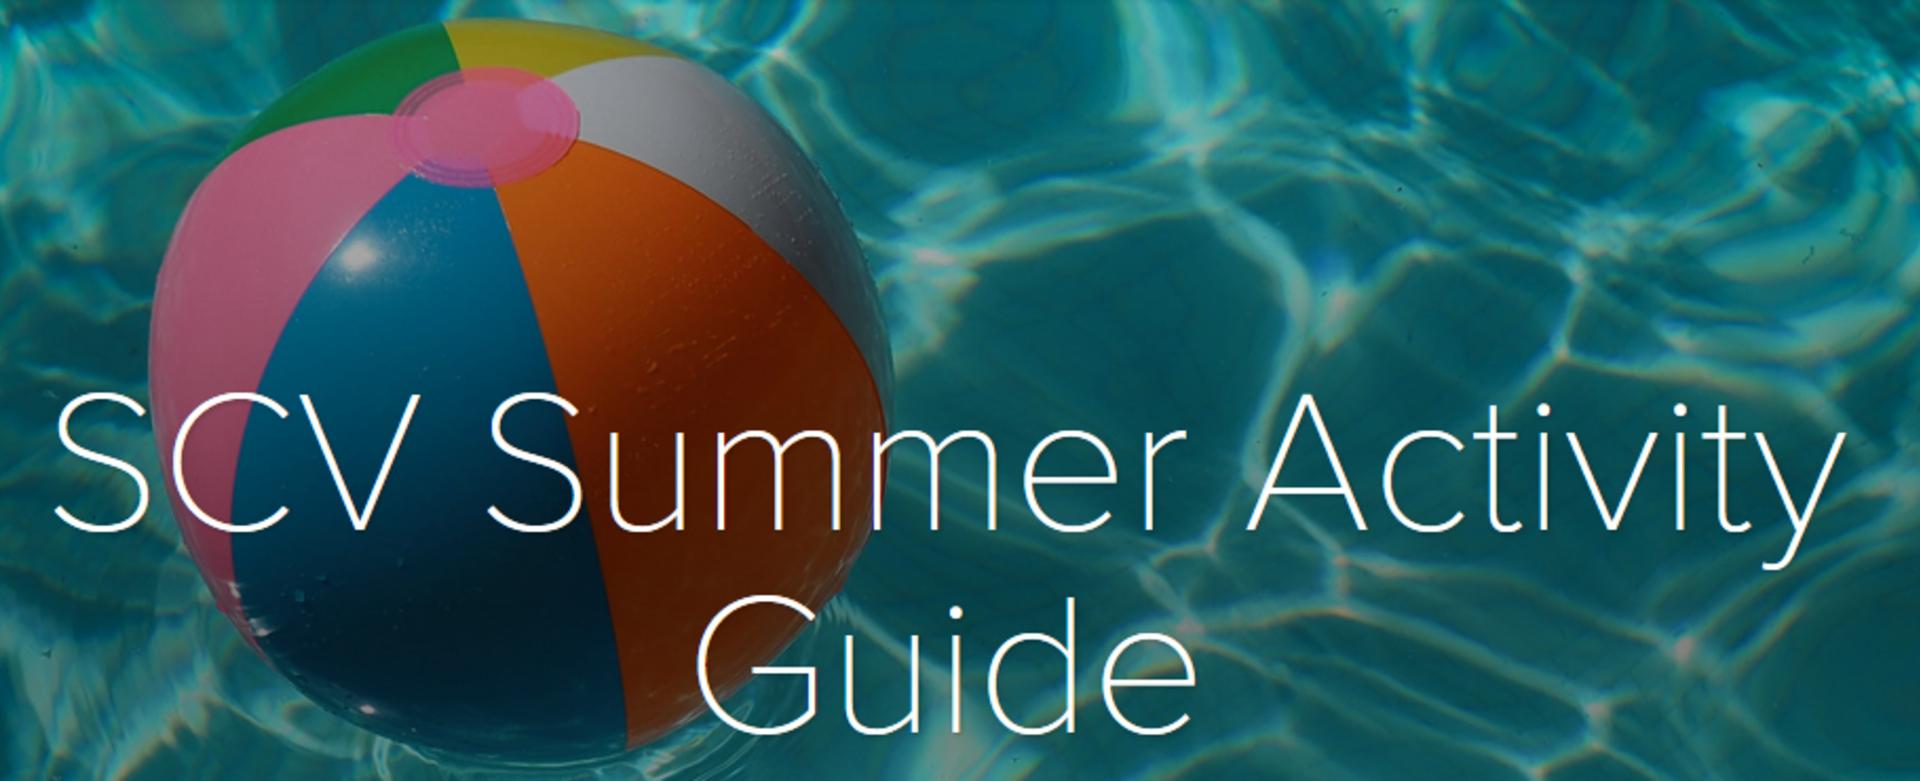 10 Summer Activities To Enjoy In Santa Clarita